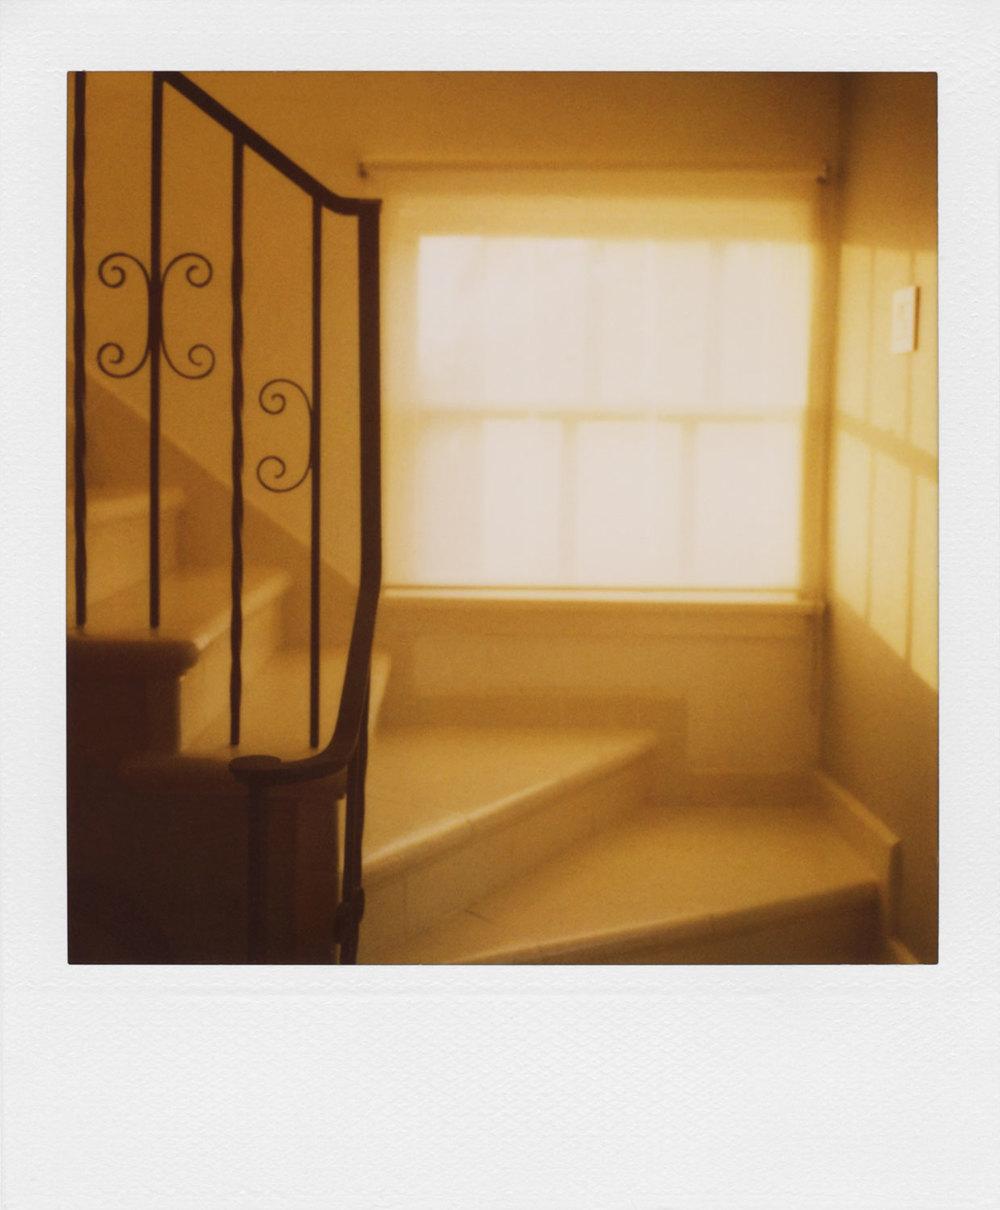 polaroid-42.jpg